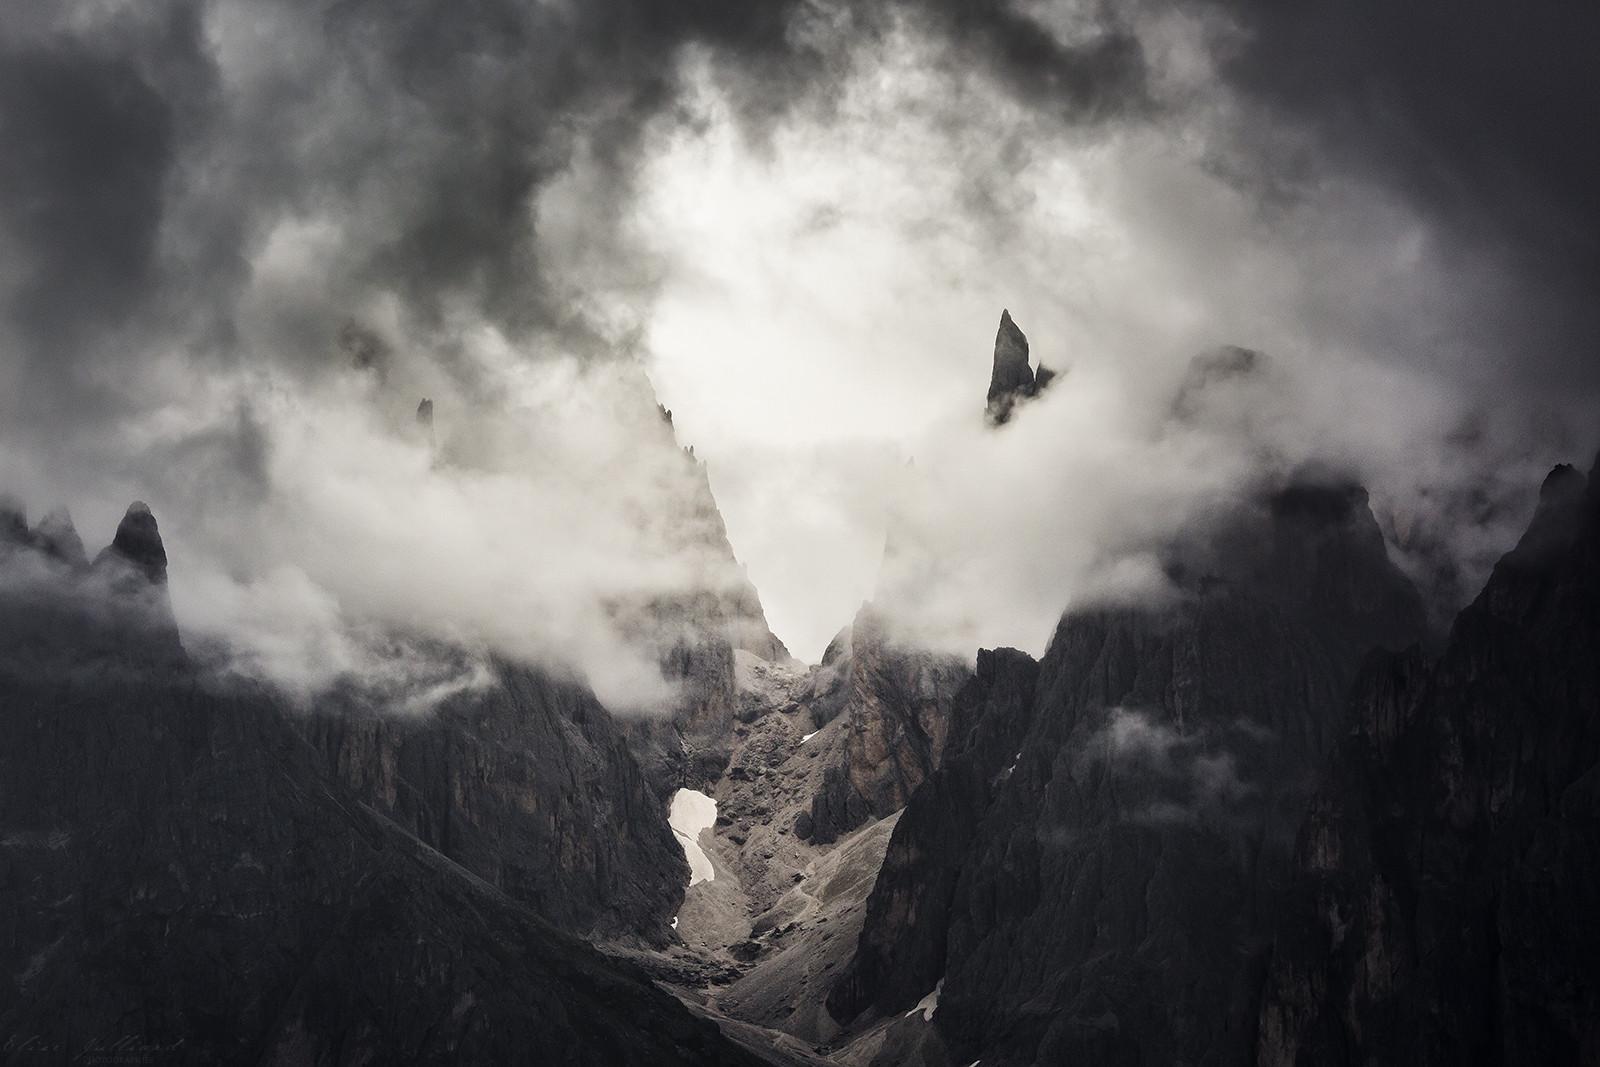 elise-julliard-photographe-lyon-france-rhone-alpes-photo-montagne-dolomites-italie-paysage-alpes-di-siusi